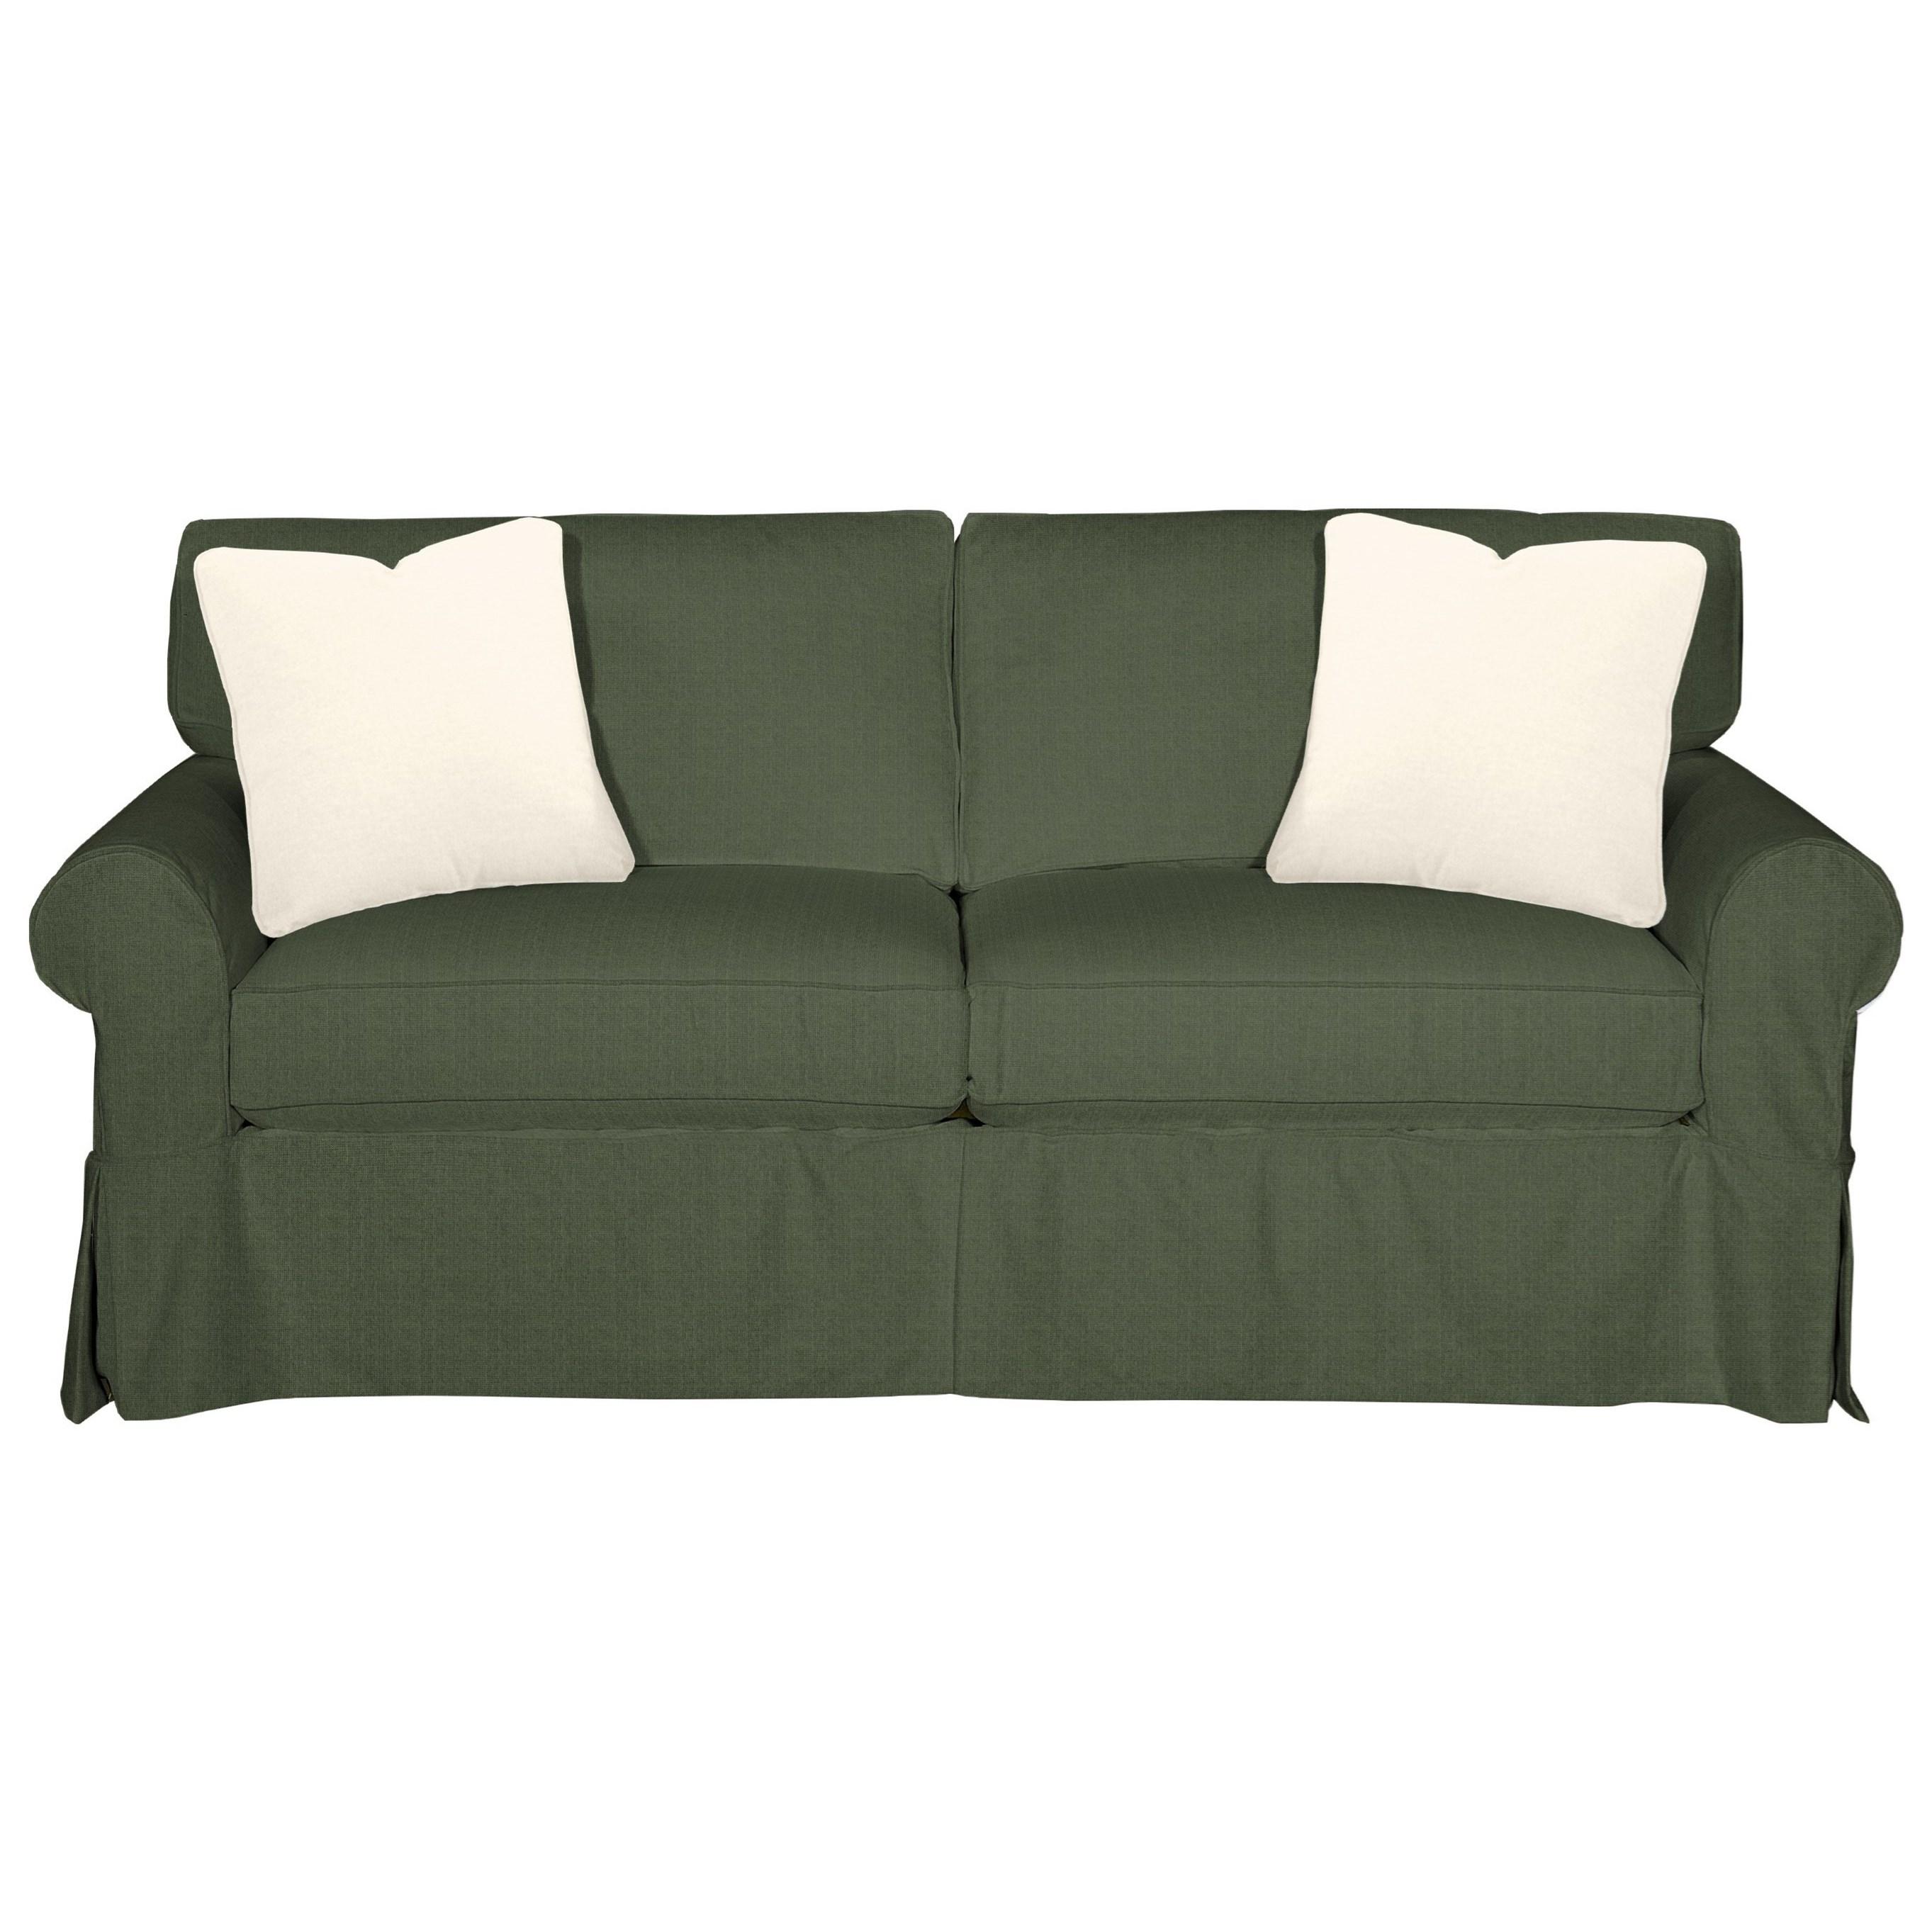 9228 Sleeper Sofa w/ Innerspring Mattress by Craftmaster at Dean Bosler's